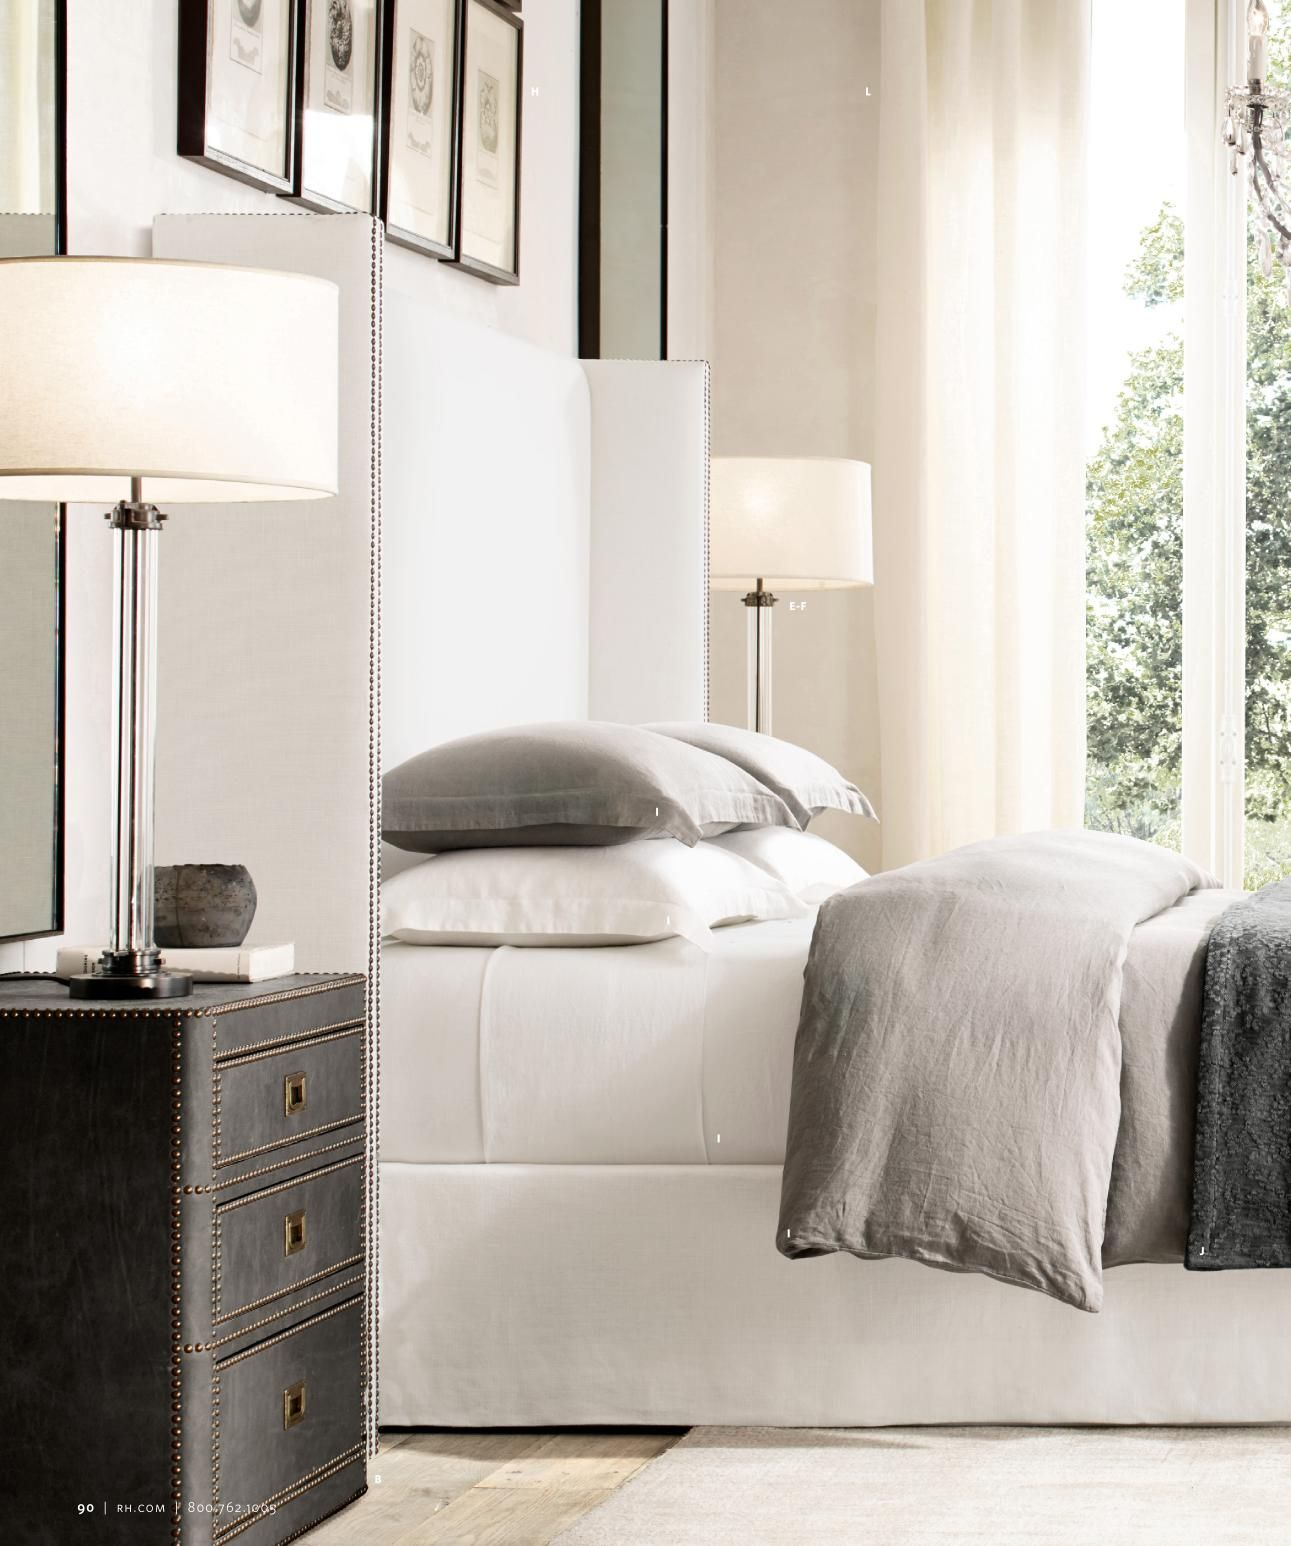 Rh source books bedroom in pinterest bedroom bed and